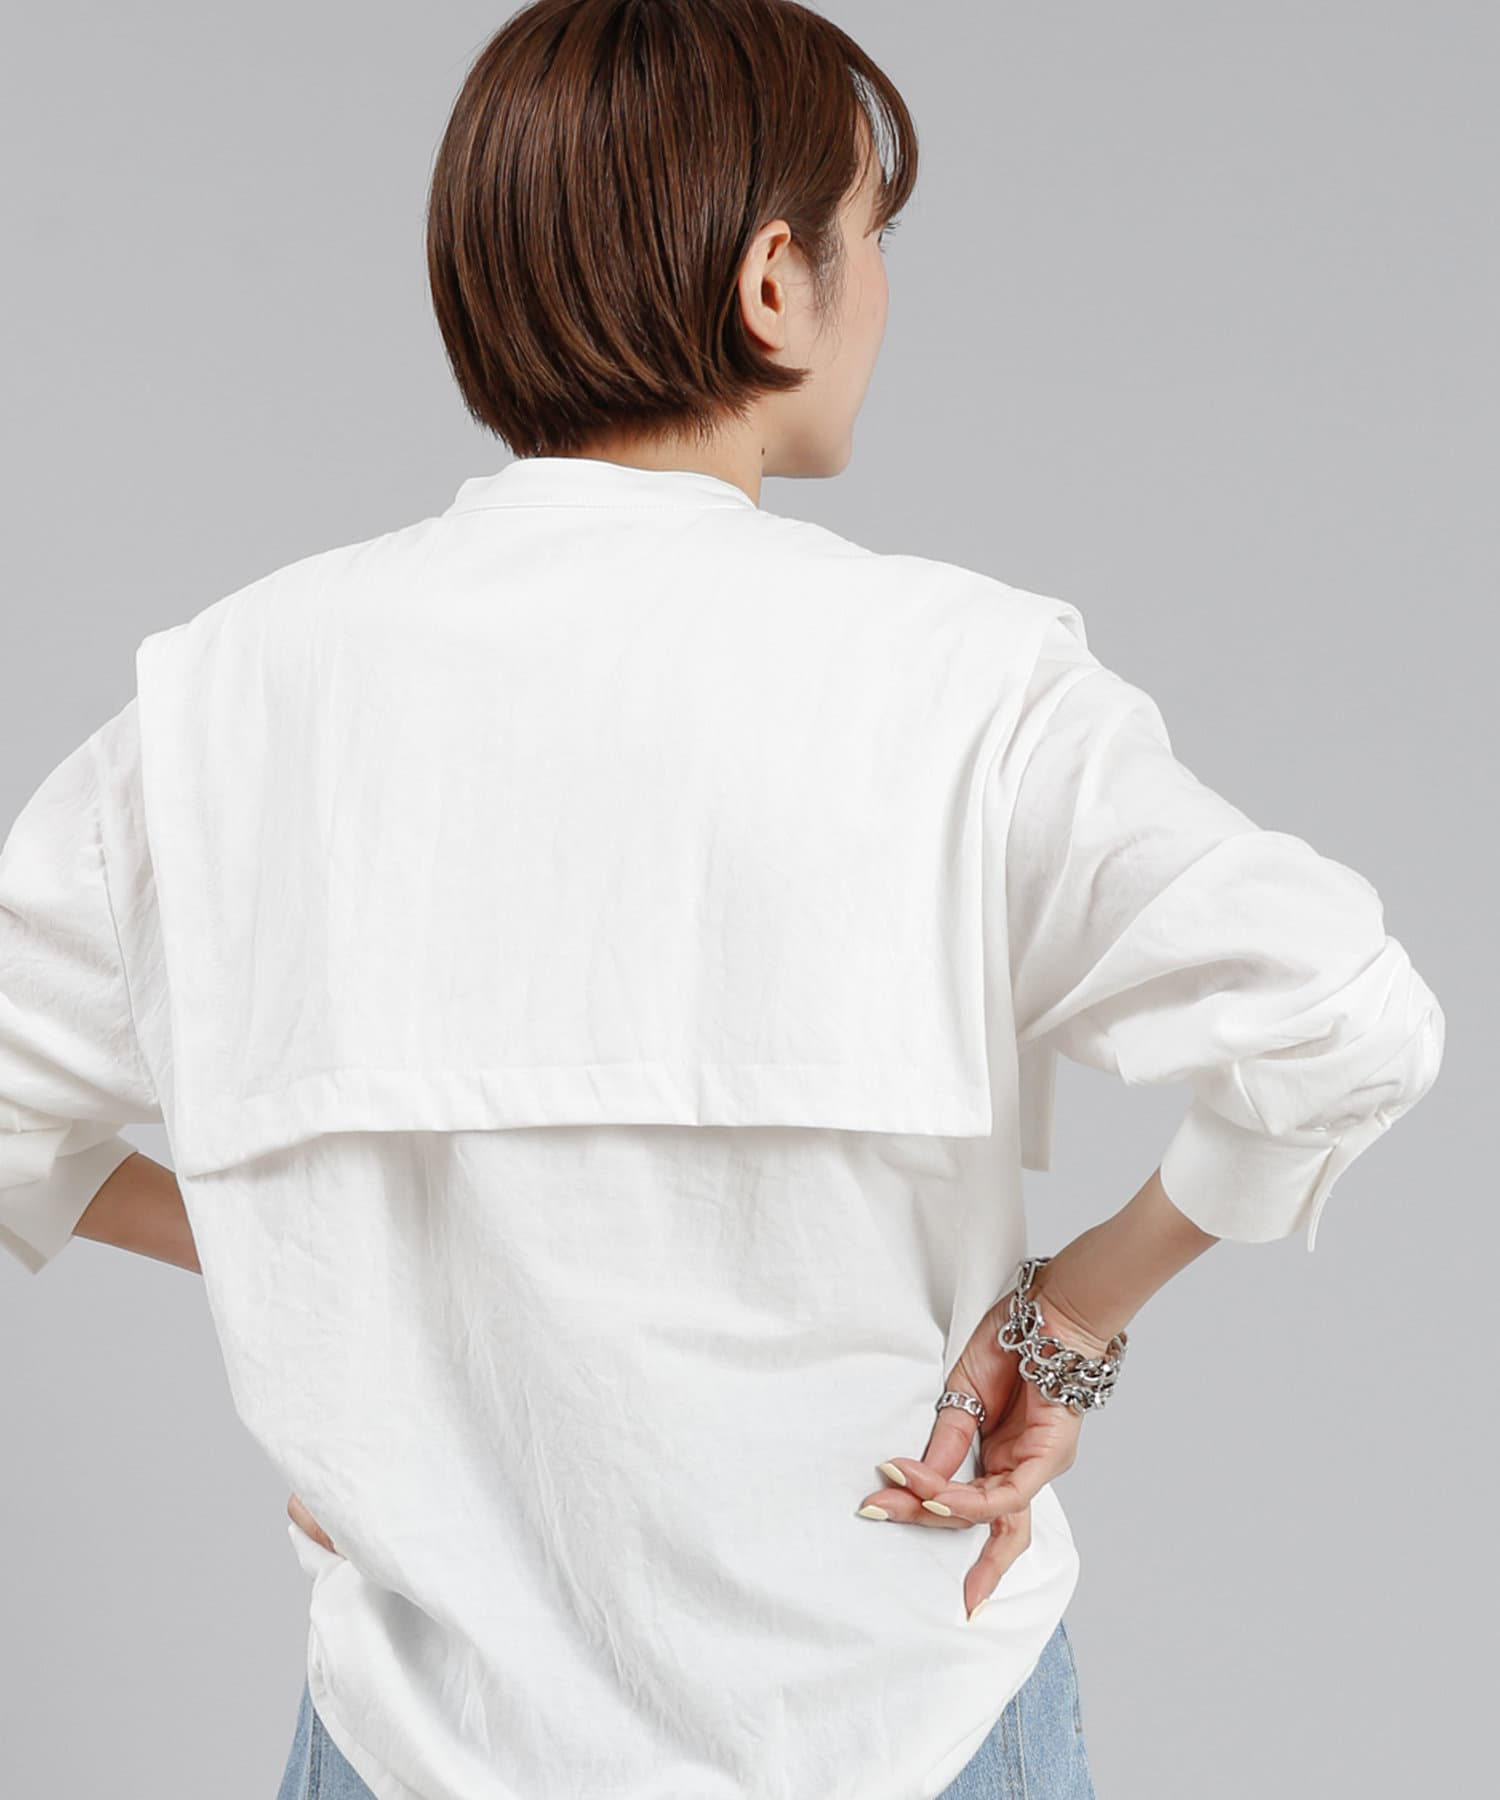 DOUDOU(ドゥドゥ) 【WEB限定】スクエアビッグカラーシャツ